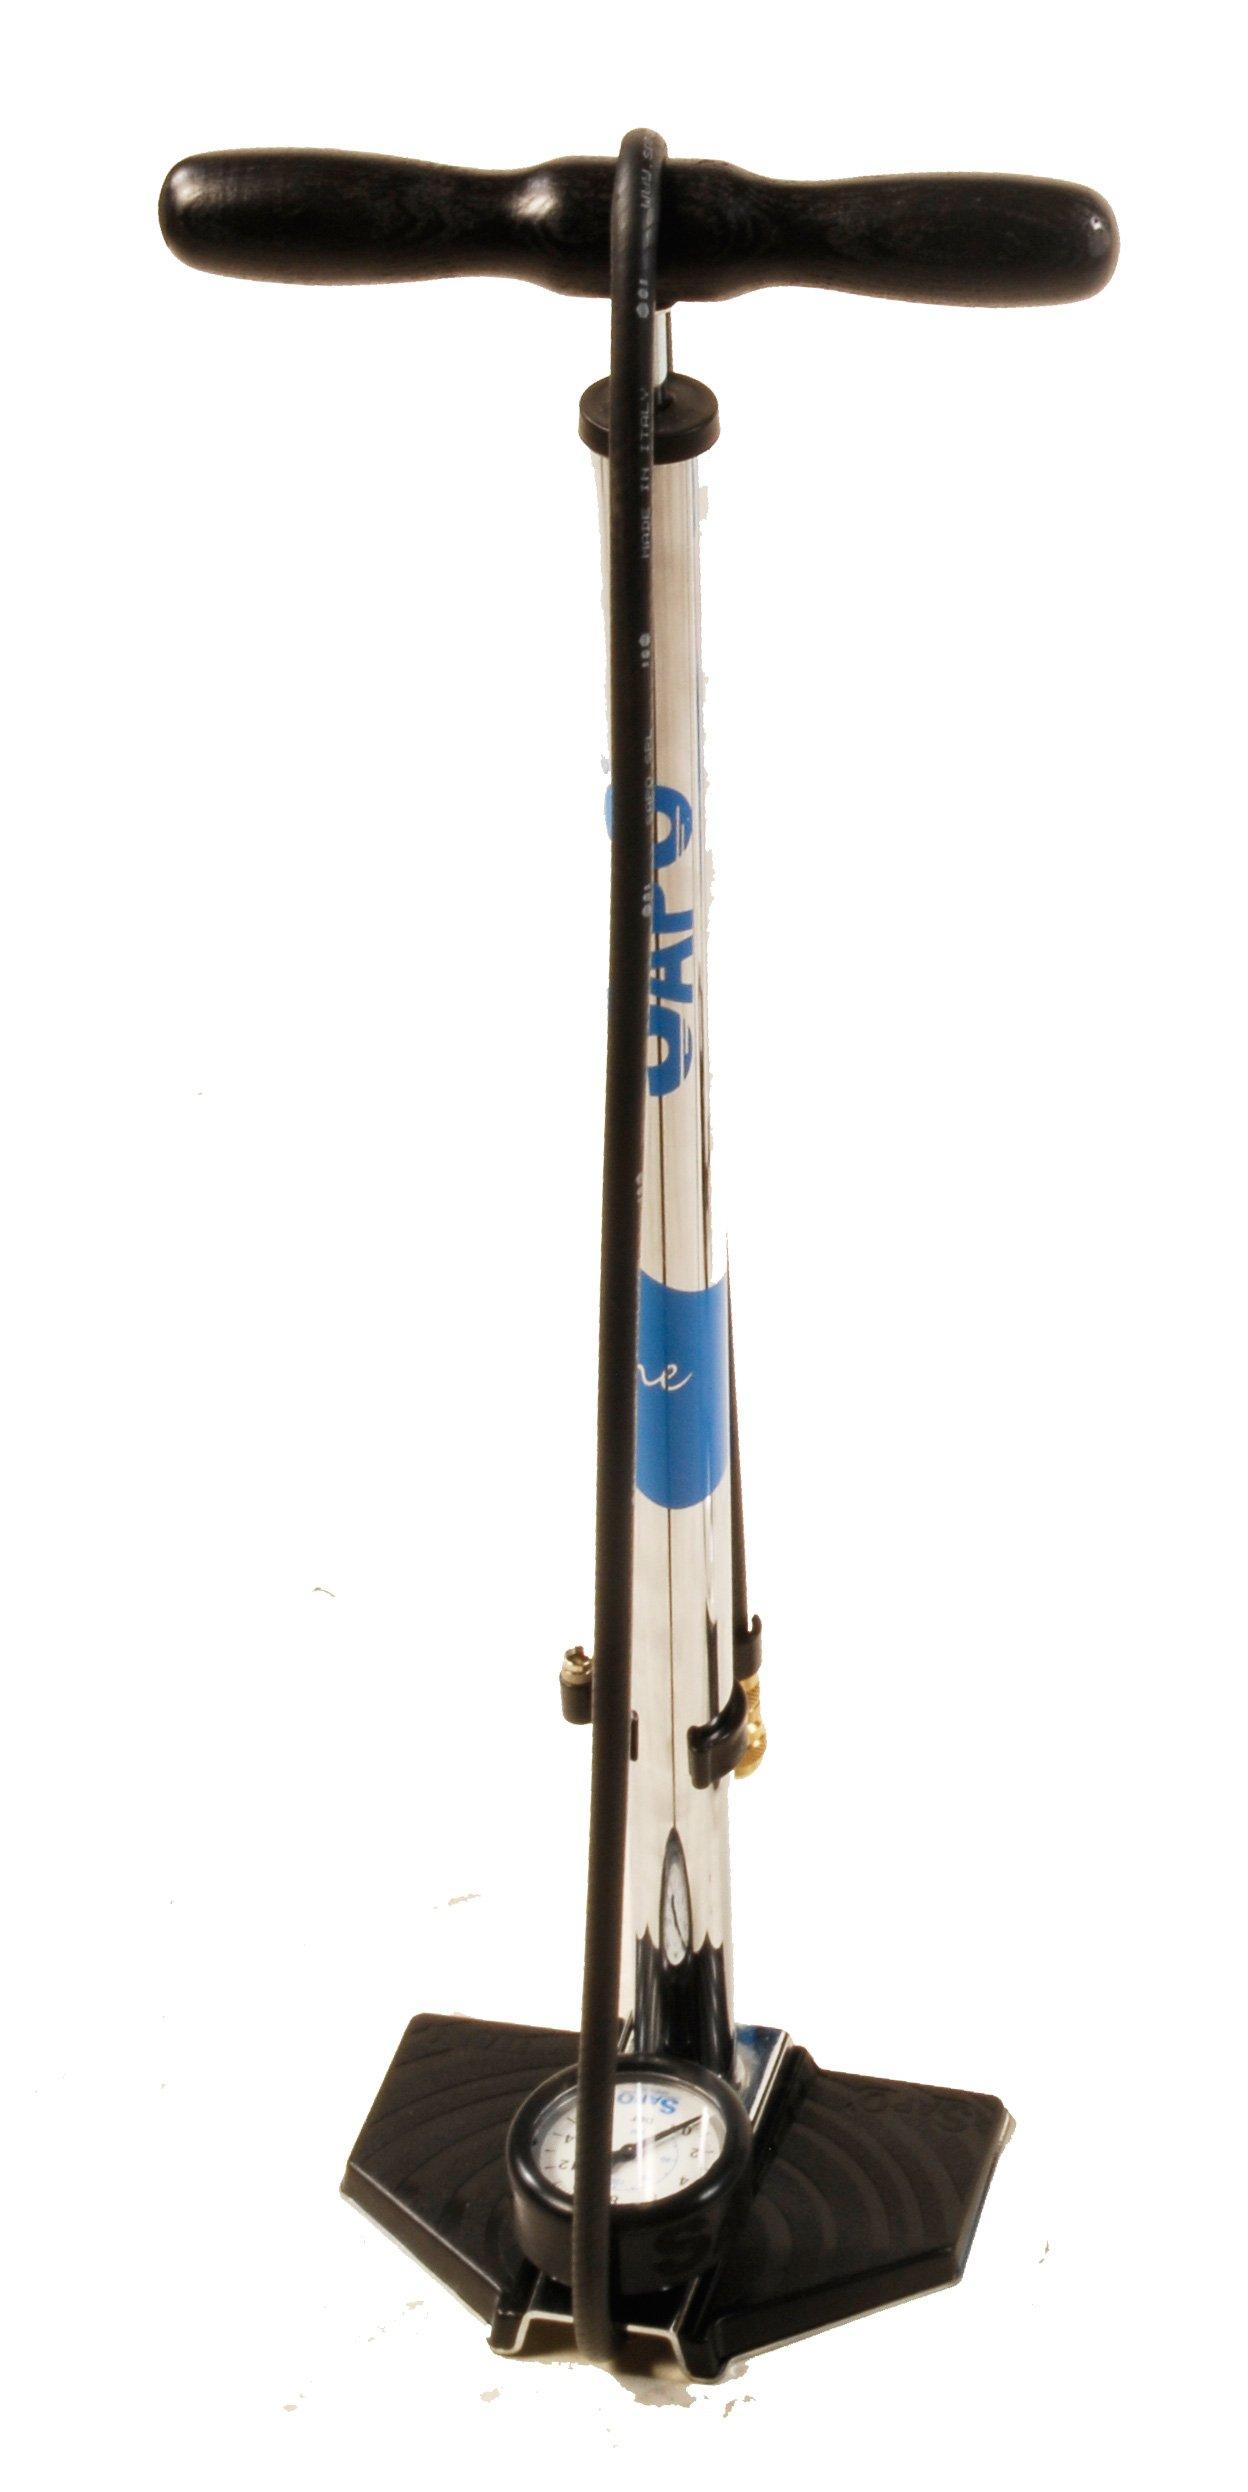 SAPO One Professional Chromated High Pressure Floor Pump